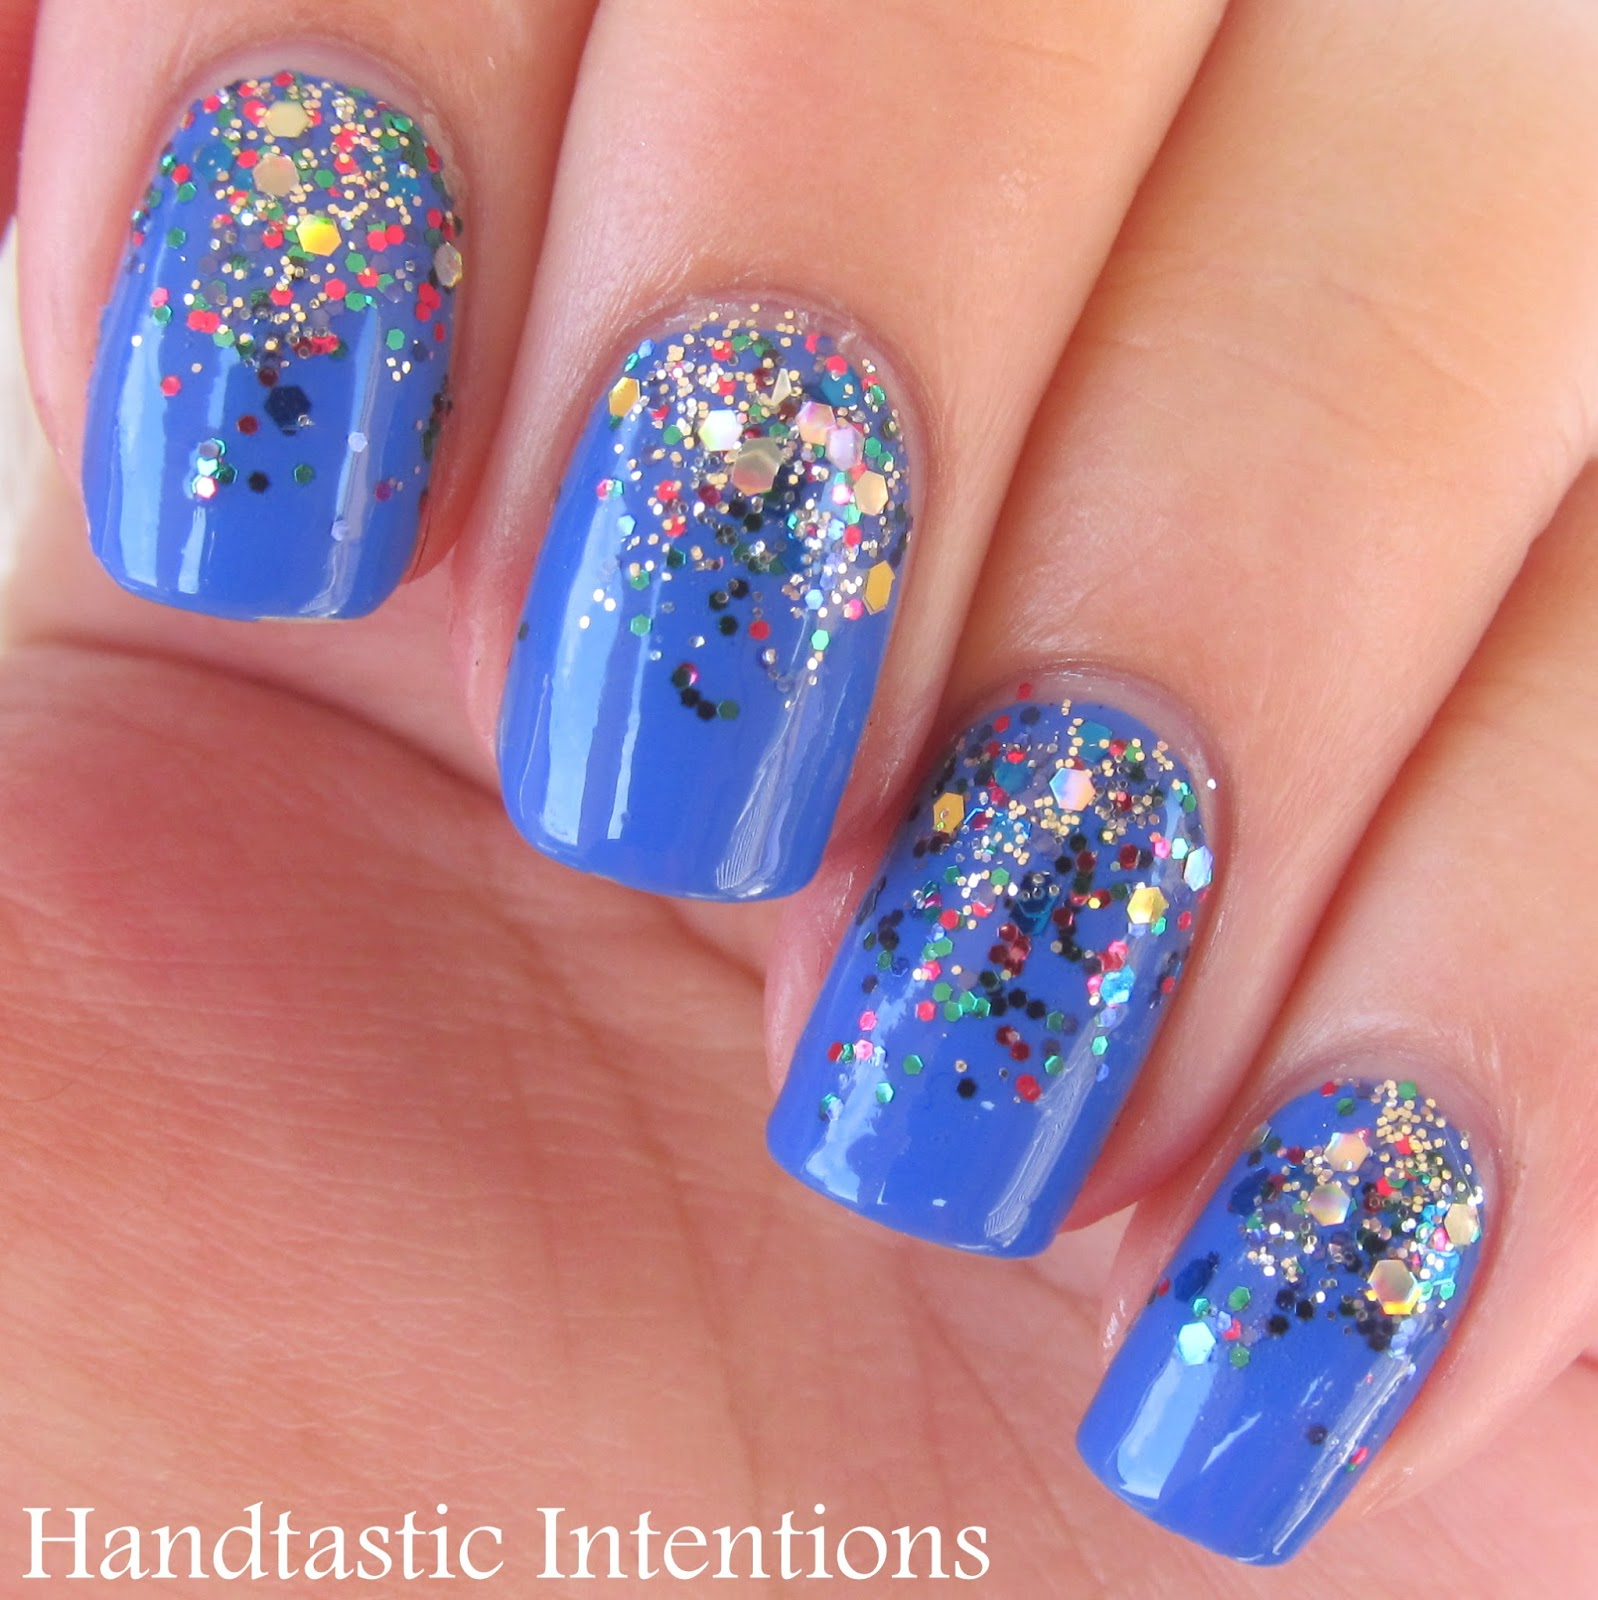 Handtastic Intentions: Nail Art: Pacific Blue Glitter Gradient